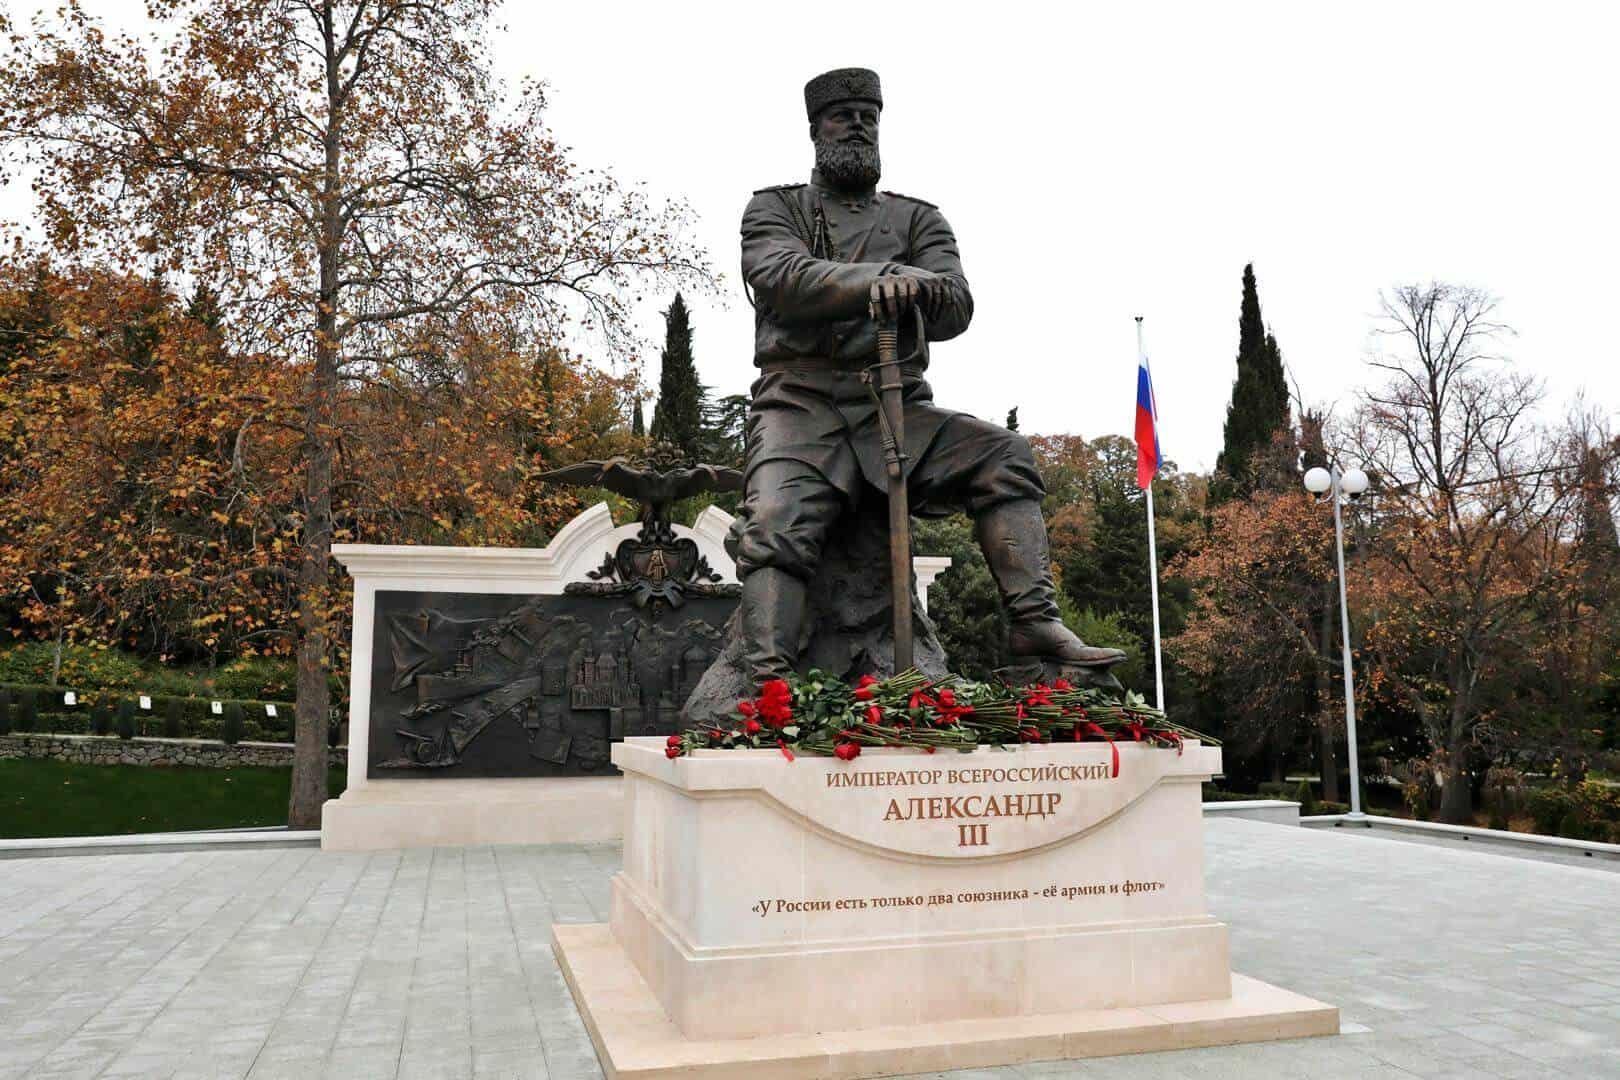 Памятник императору Александру III в парке Ливадии на месте Малого дворца. Фото 2020 г.